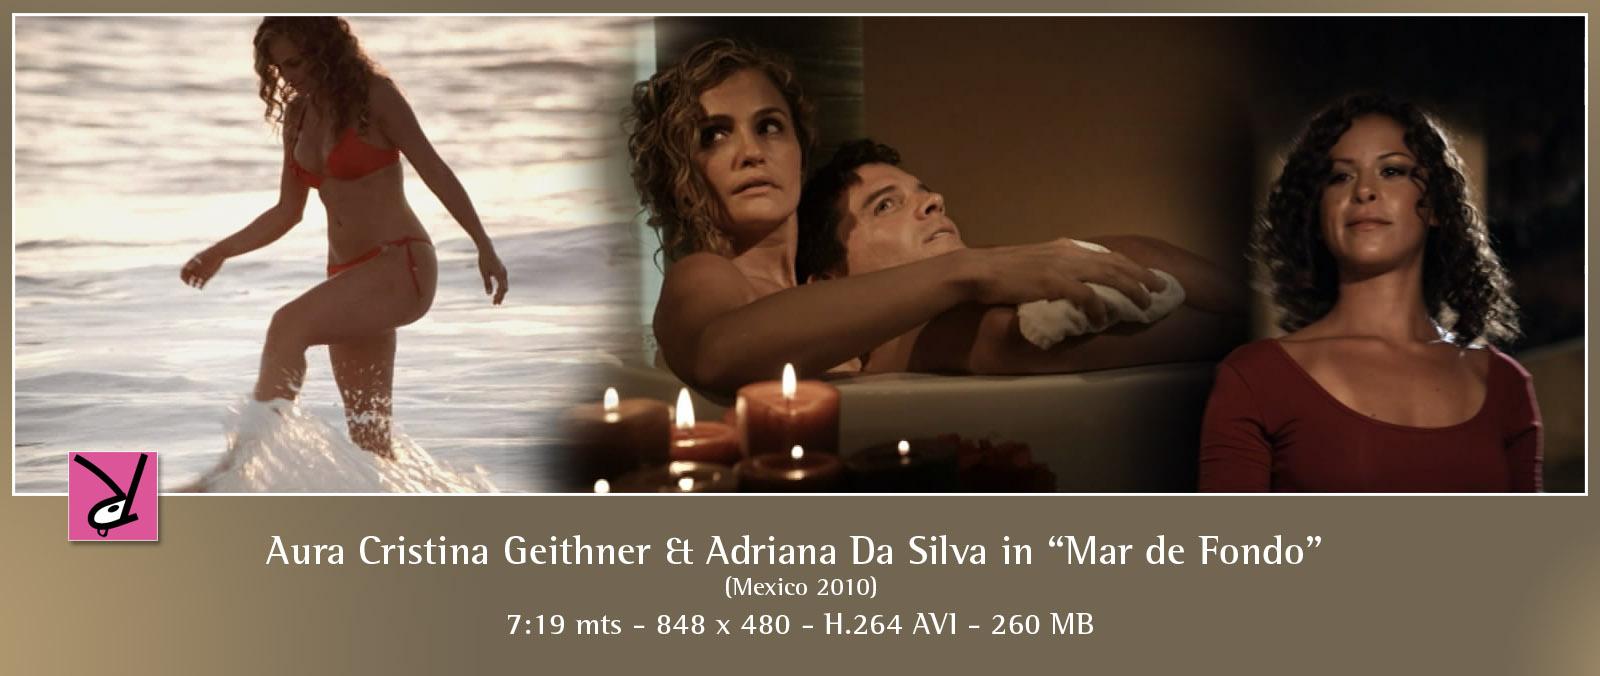 Aura cristina geithner nude